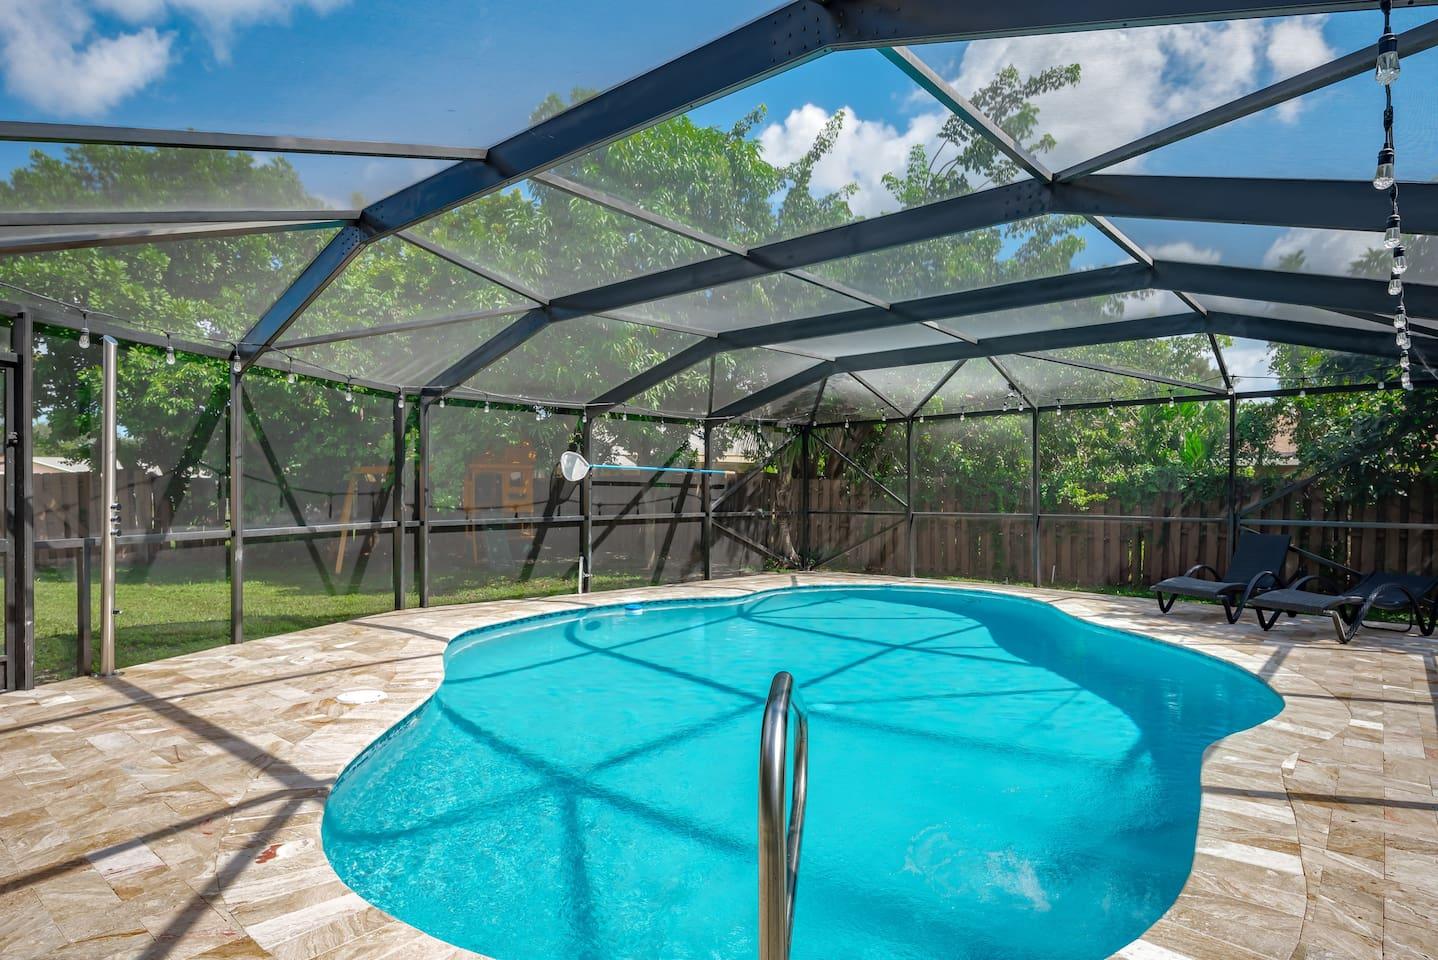 Brand New Pool Area, Heated Saltwaterpool, Stainless Steel Shower, Travertine Pavers.